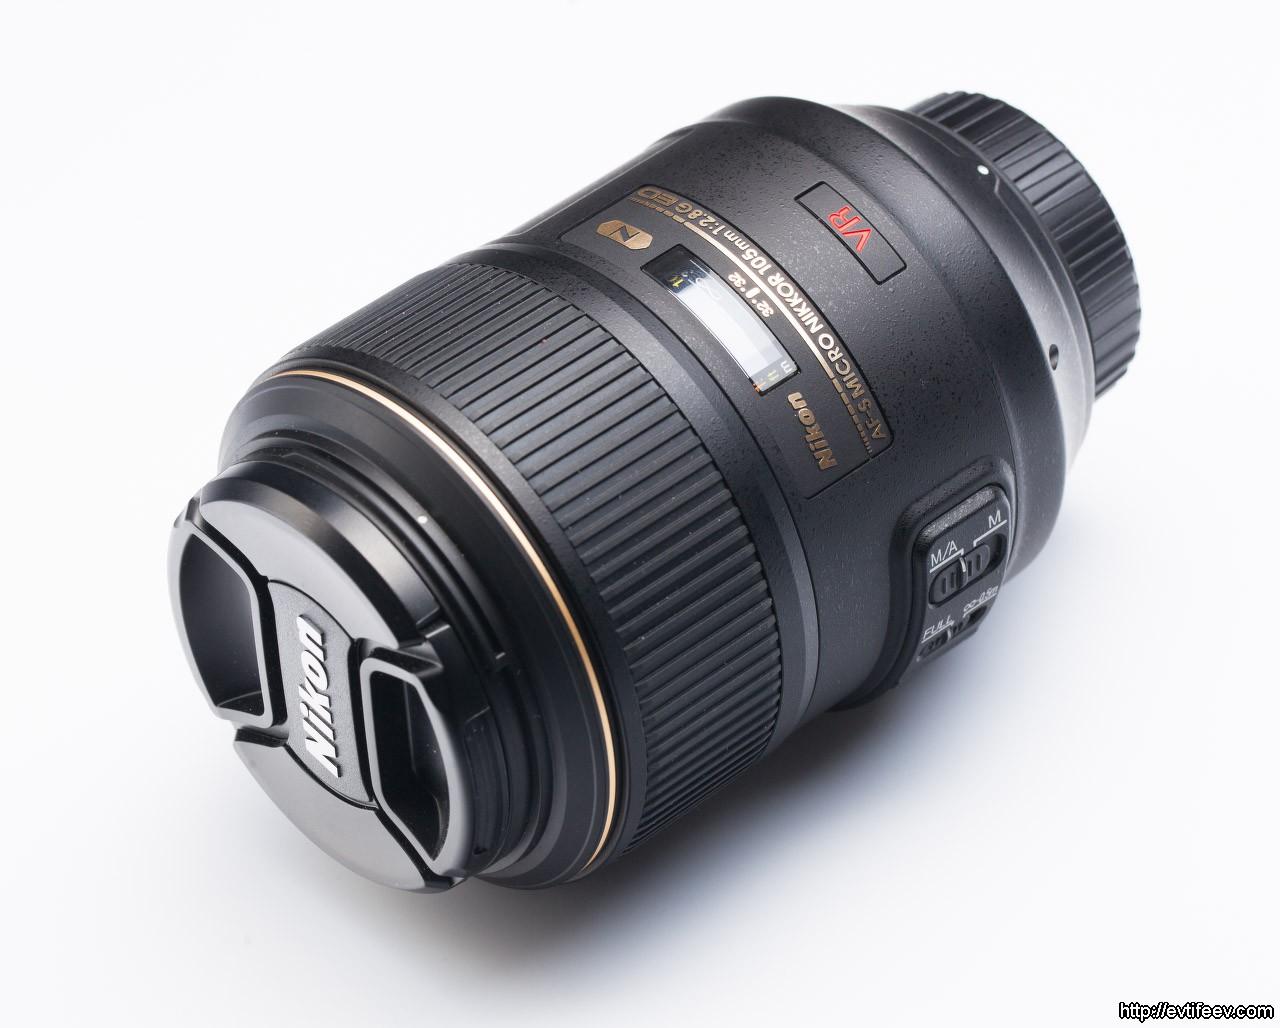 Nikon AF-S Micro Nikkor 105/2.8G ED